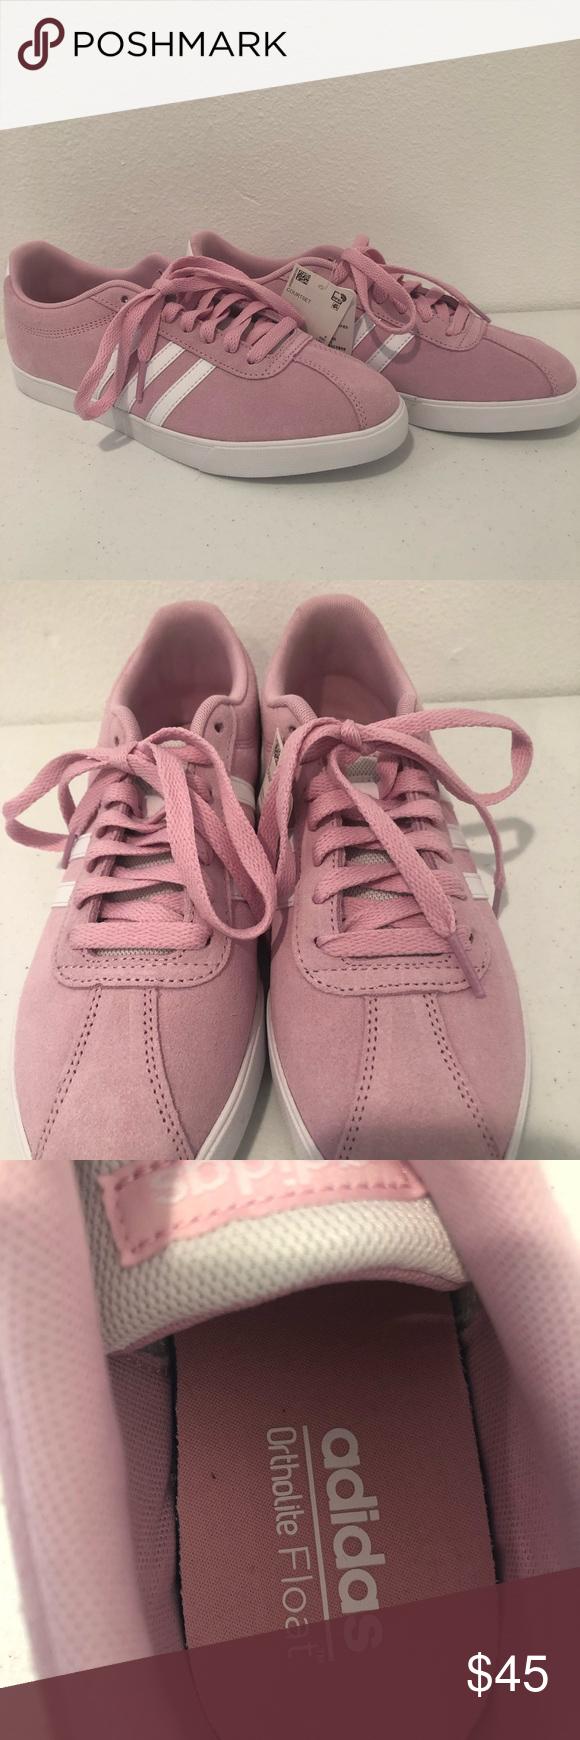 Pink adidas, Pink adidas shoes